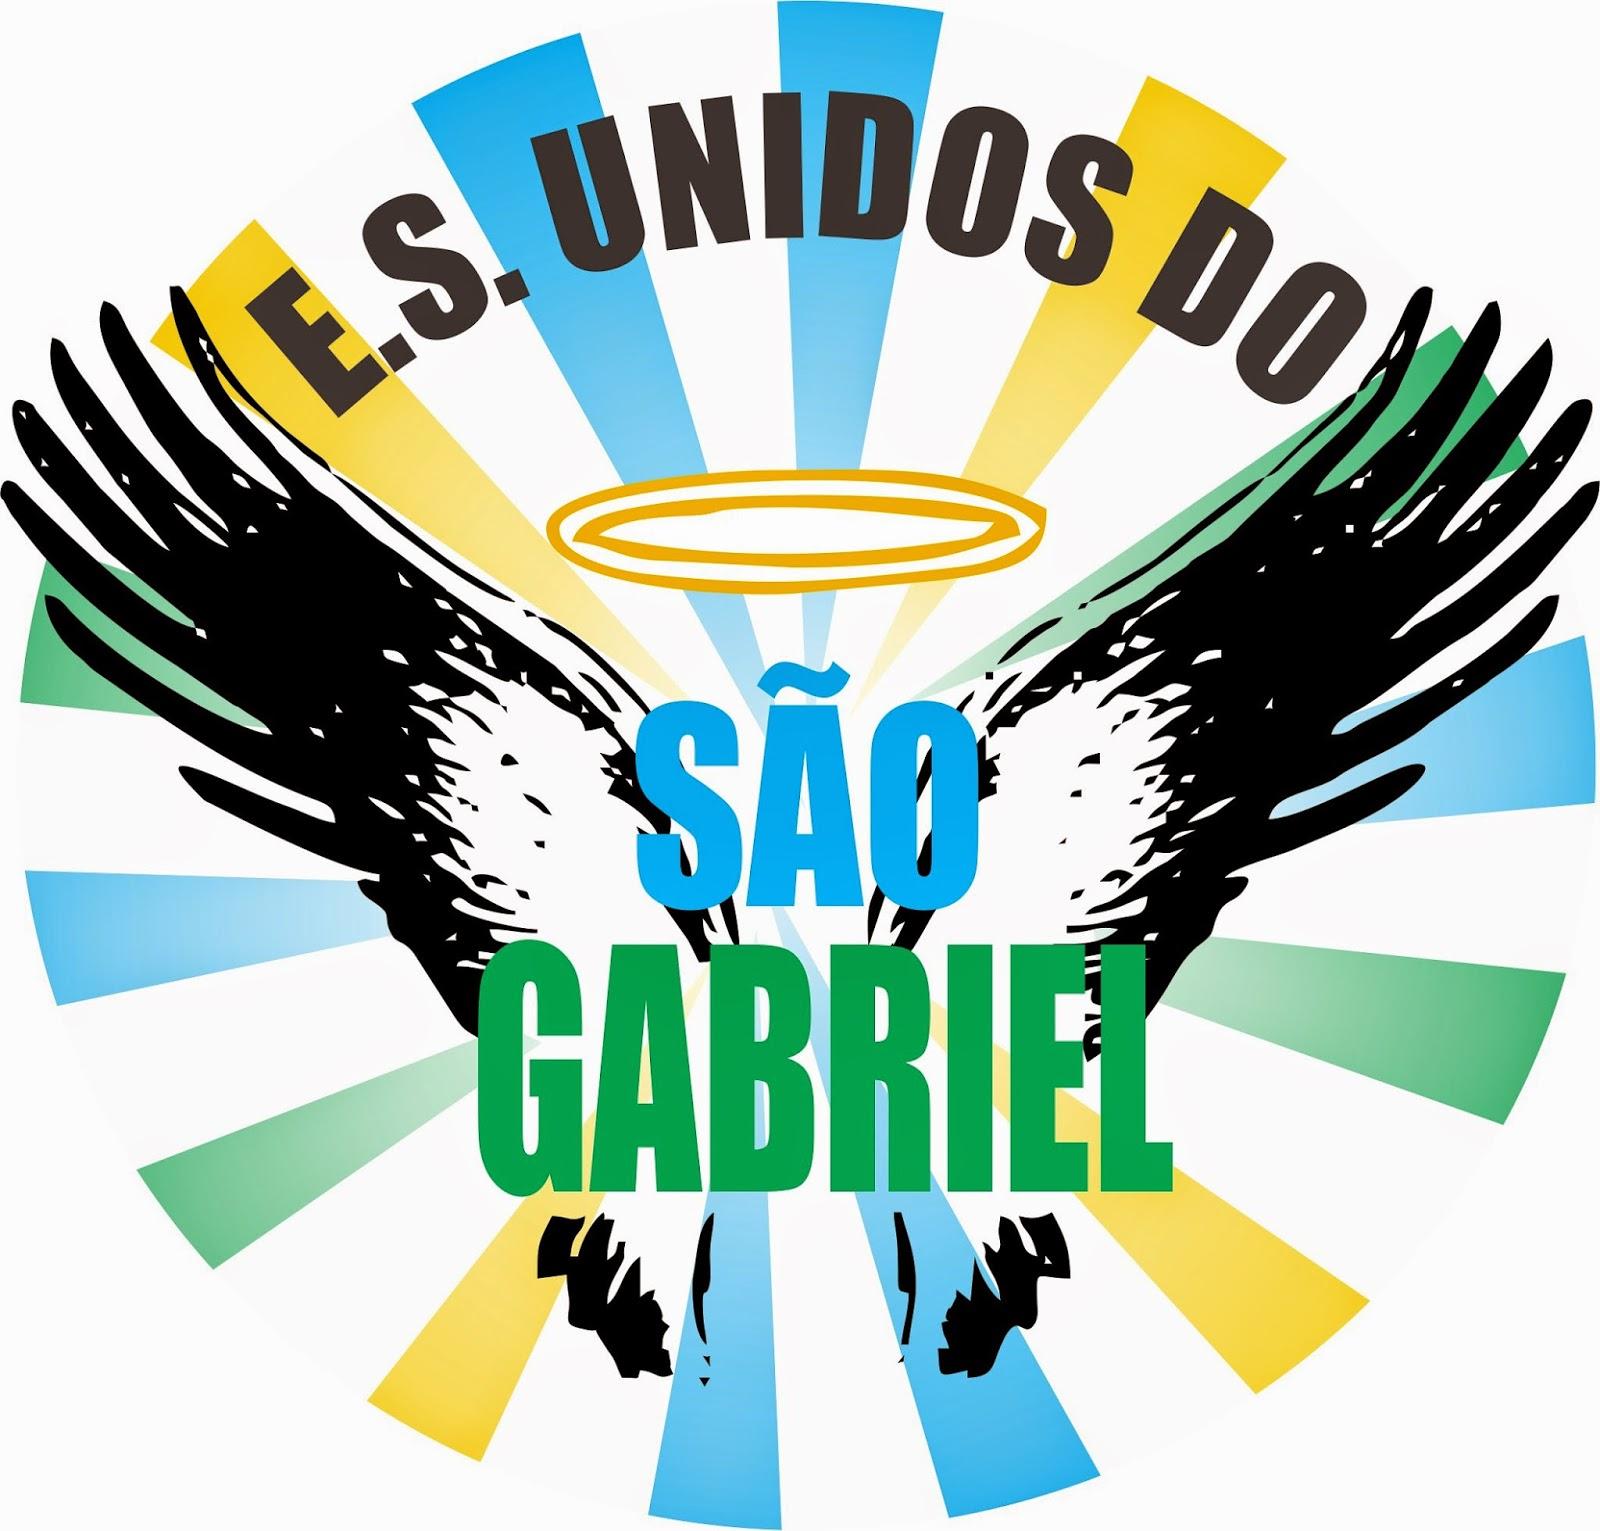 https://www.facebook.com/carnavalAG2018/videos/401248950324335/